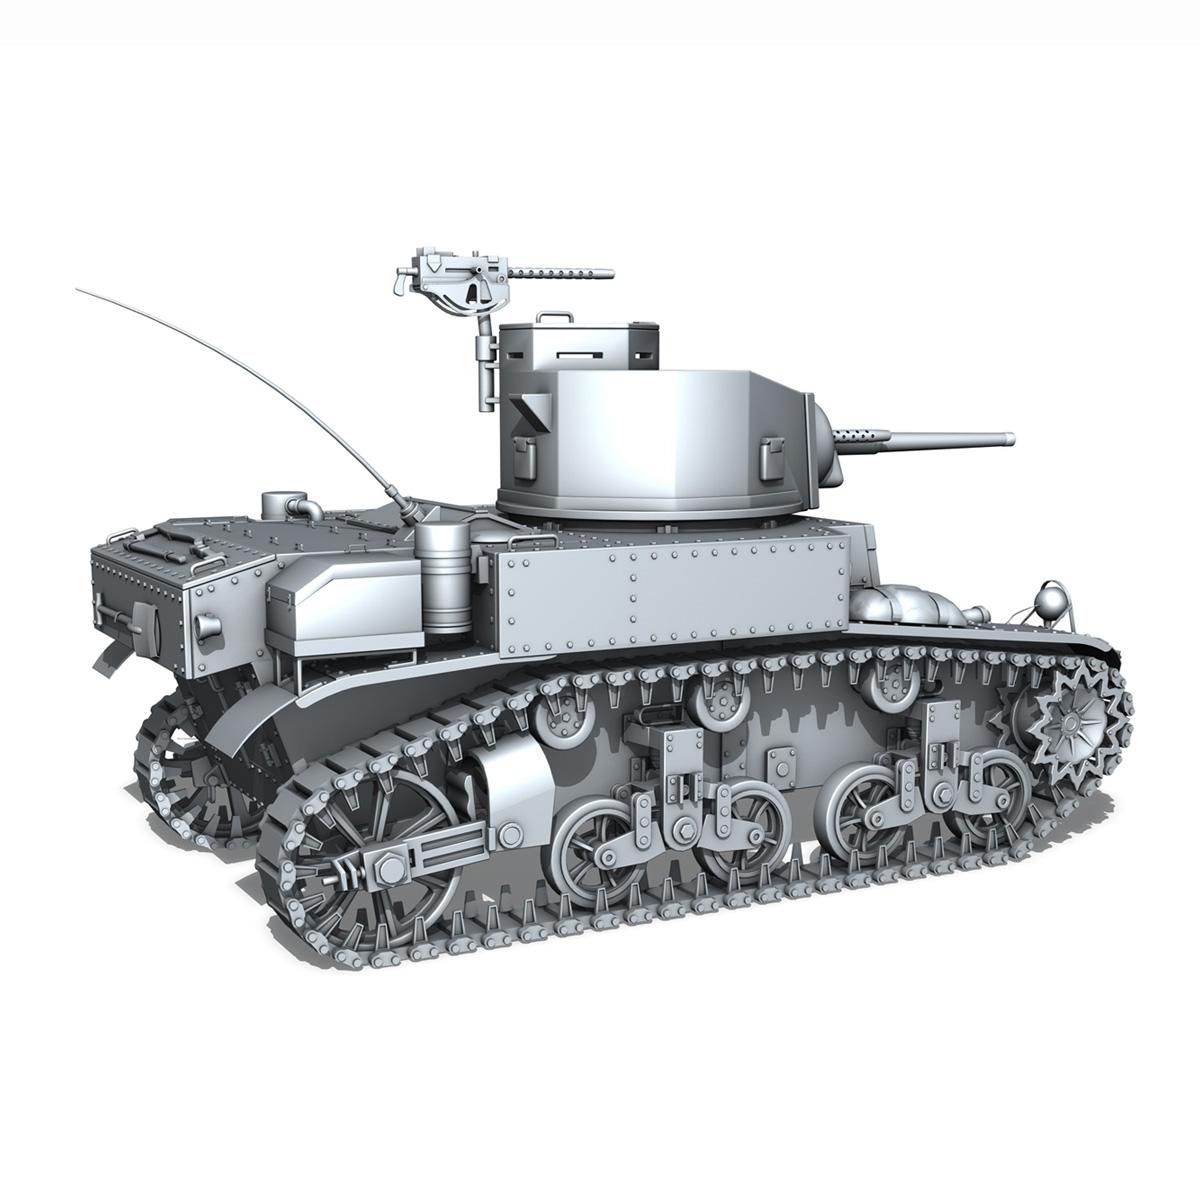 m3 light tank stuart – early production 3d model 3ds fbx c4d lwo obj 189174